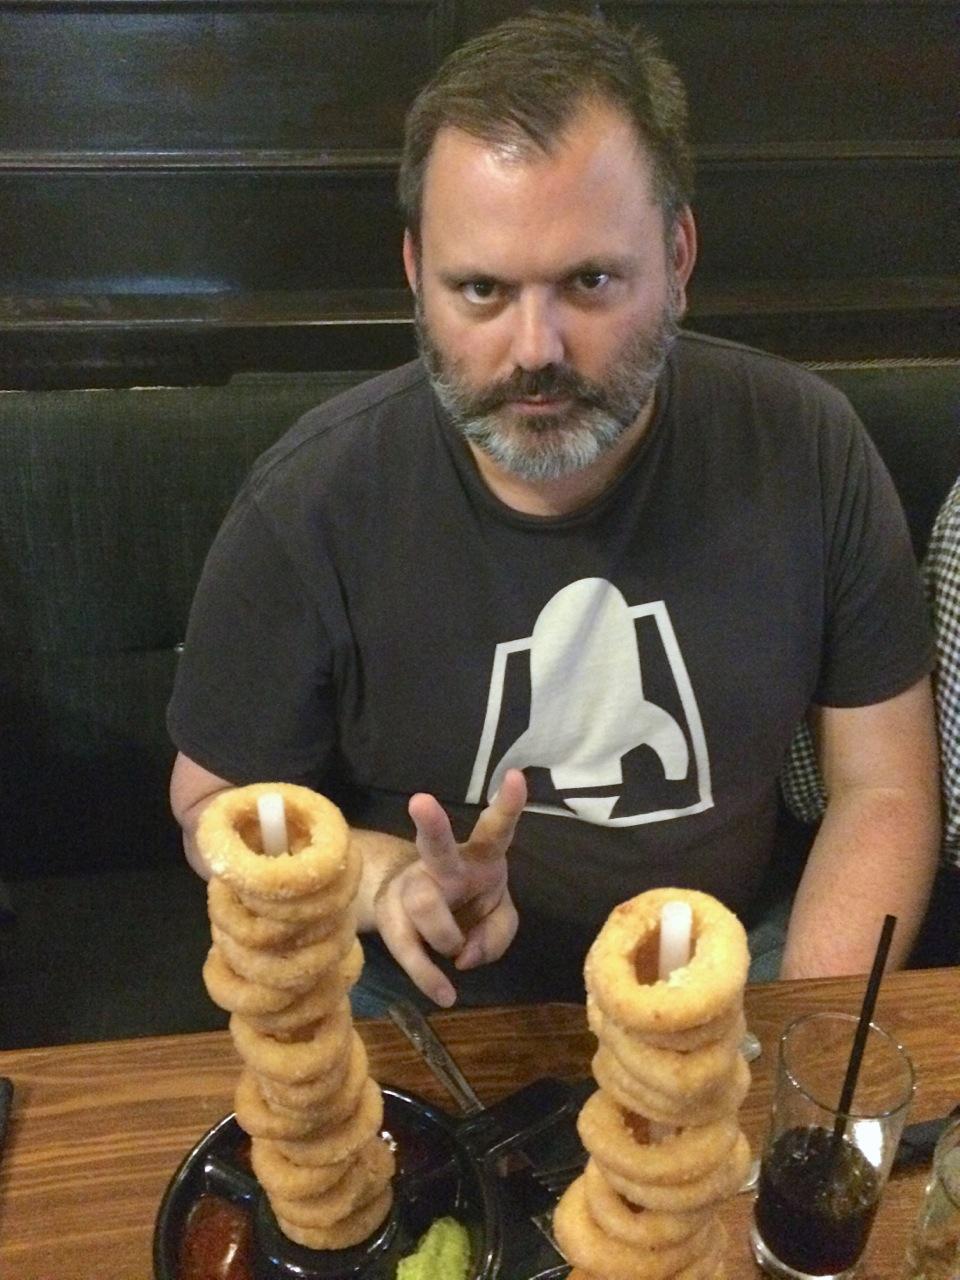 http://i2.wp.com/fatgayvegan.com/wp-content/uploads/2015/08/FGV-with-vegan-onion-rings.jpg?fit=960%2C1280